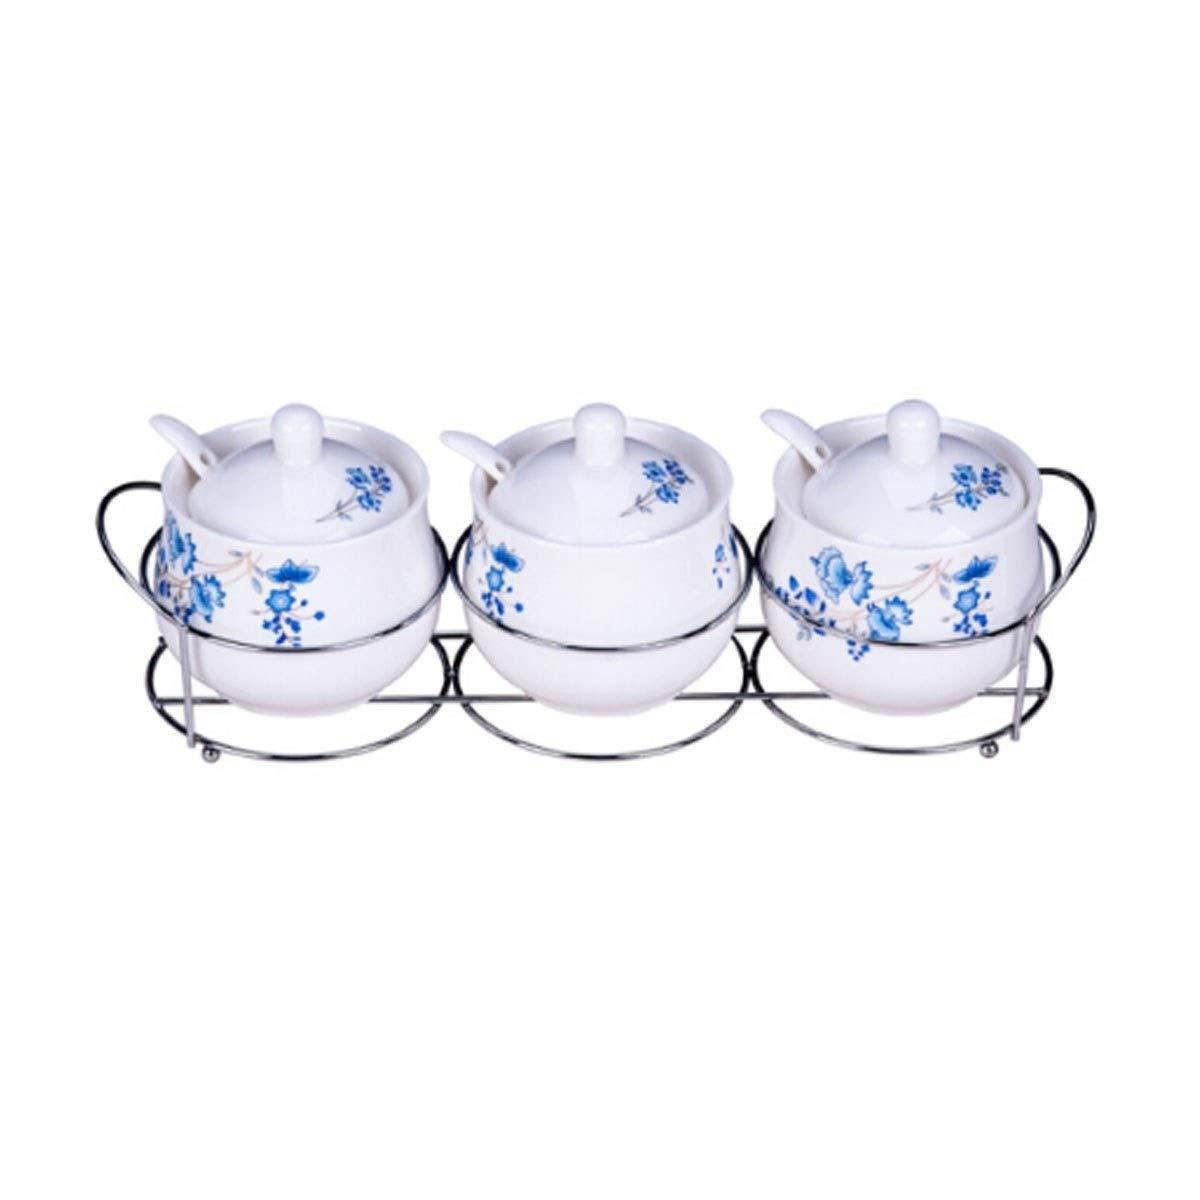 MINGRUIGONGMAO Spice Jar, Ceramic Seasoning Jar, Three-piece Set Garden Floral Seasoning Box, Set Seasoning Box Plush toys (Size : Multi-colored) by MINGRUIGONGMAO